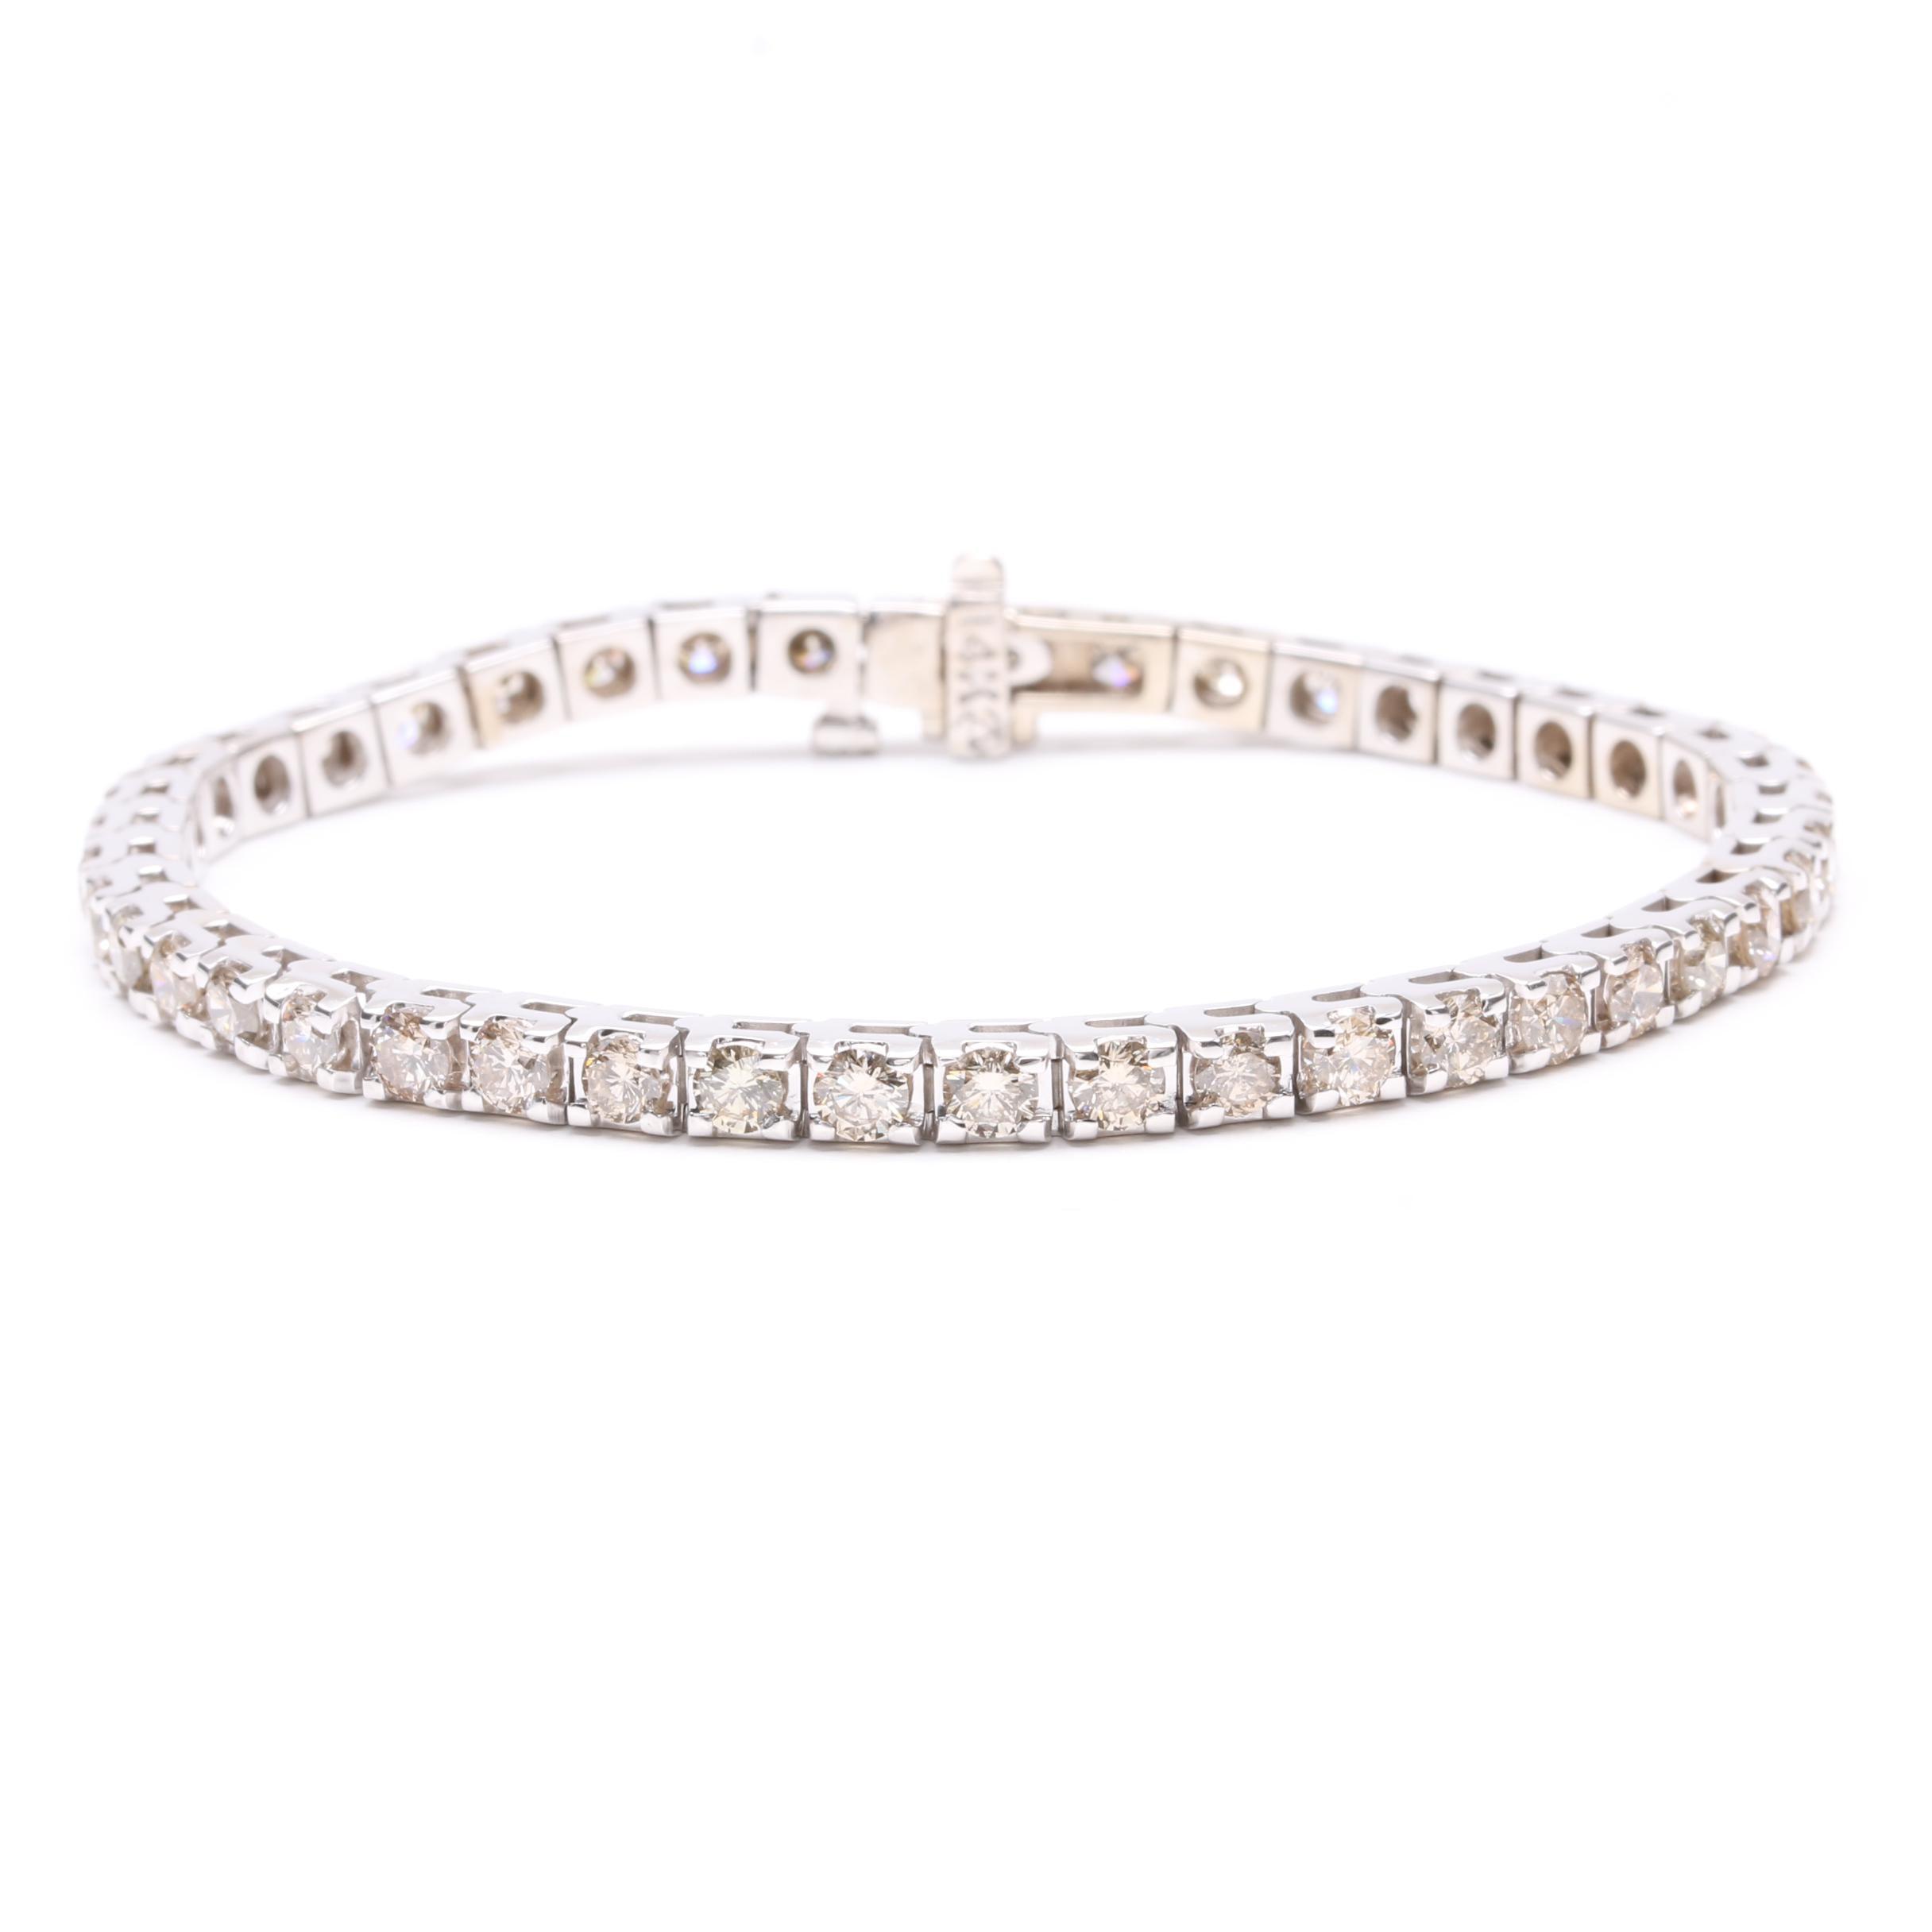 14K White Gold 5.00 CTW Diamond Tennis Bracelet